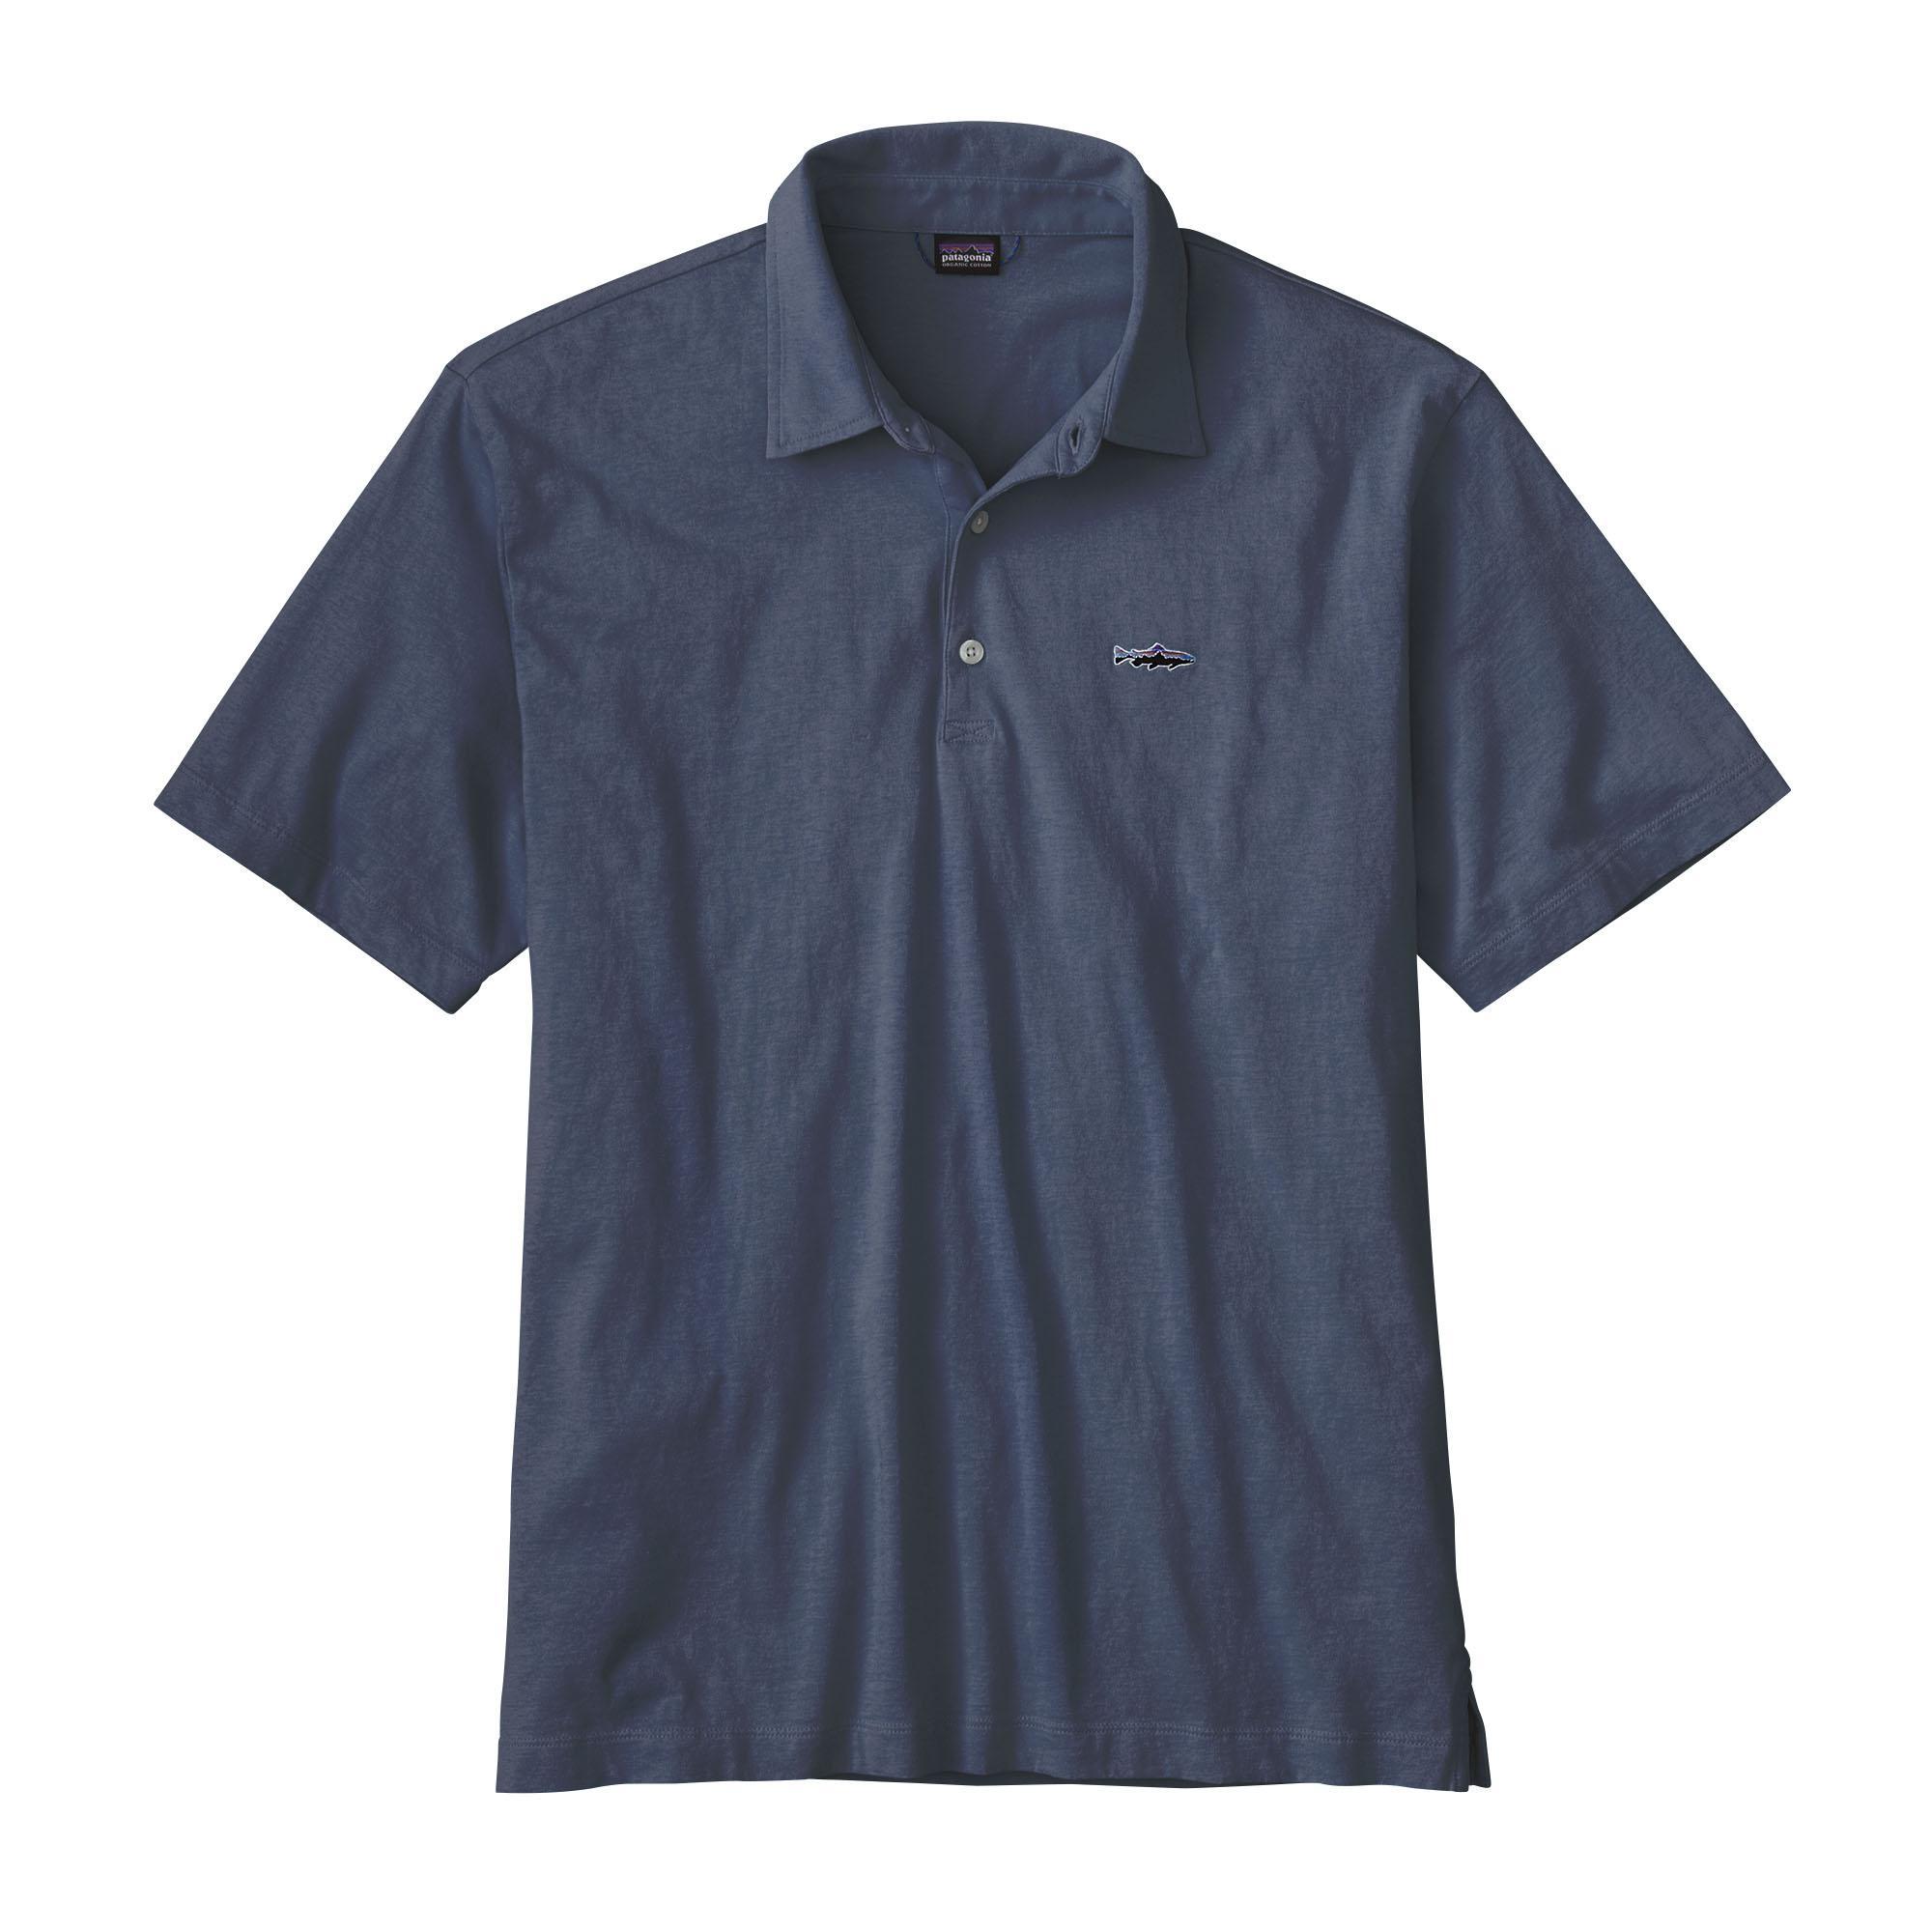 Patagonia Men's Polo- Trout Fitz Roy shirt PRB_BLUE